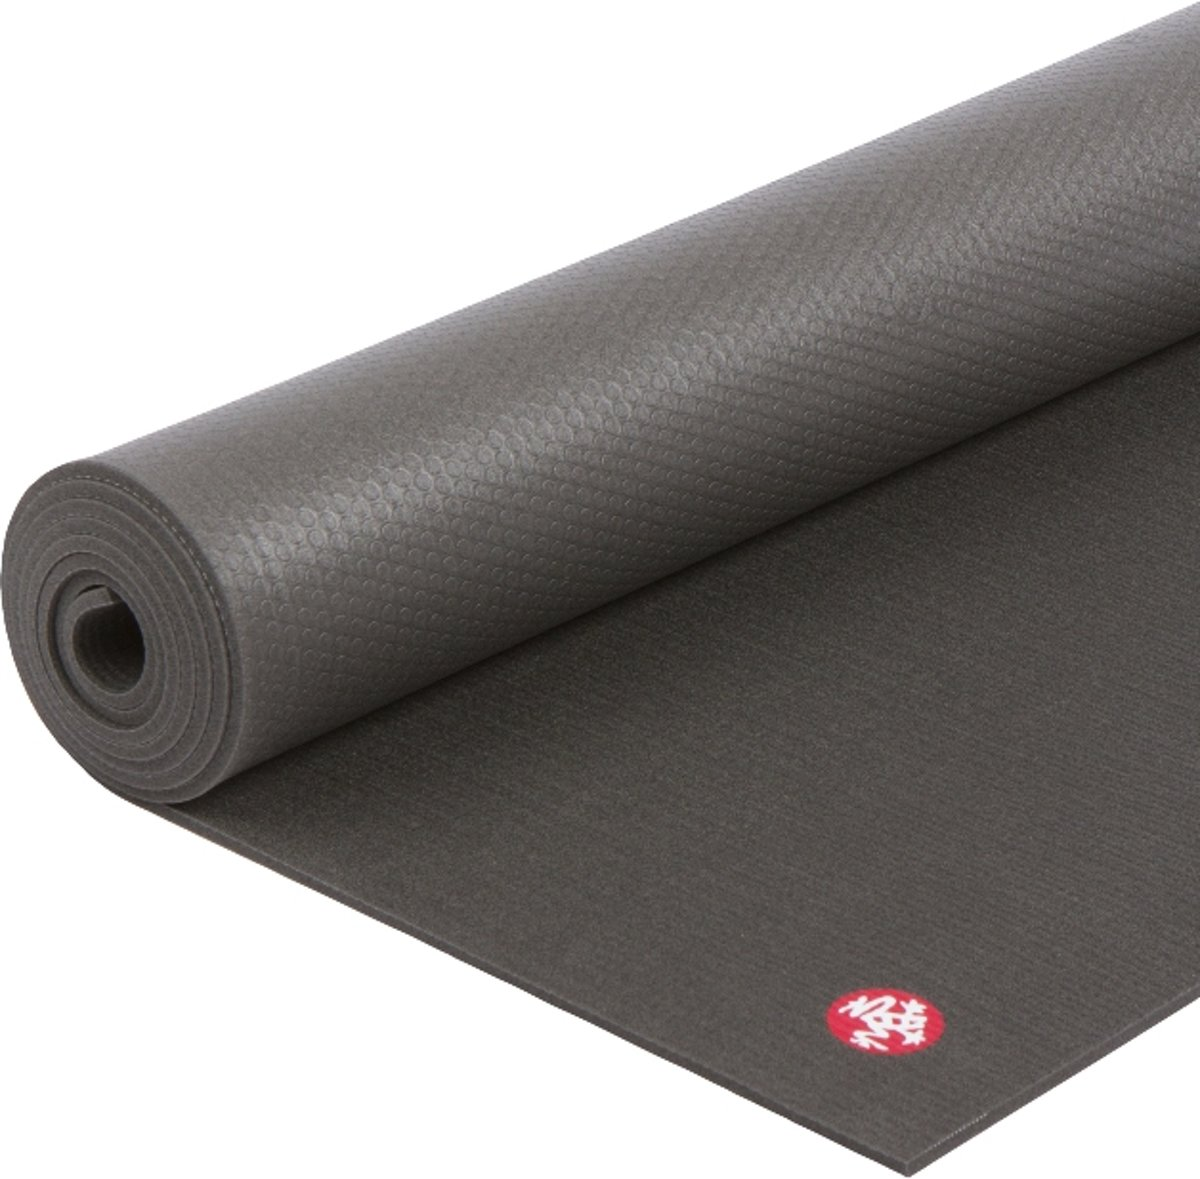 Manduka Black Pro - Yoga mat - 216 cm x 66 cm x 0,6 cm - Zwart